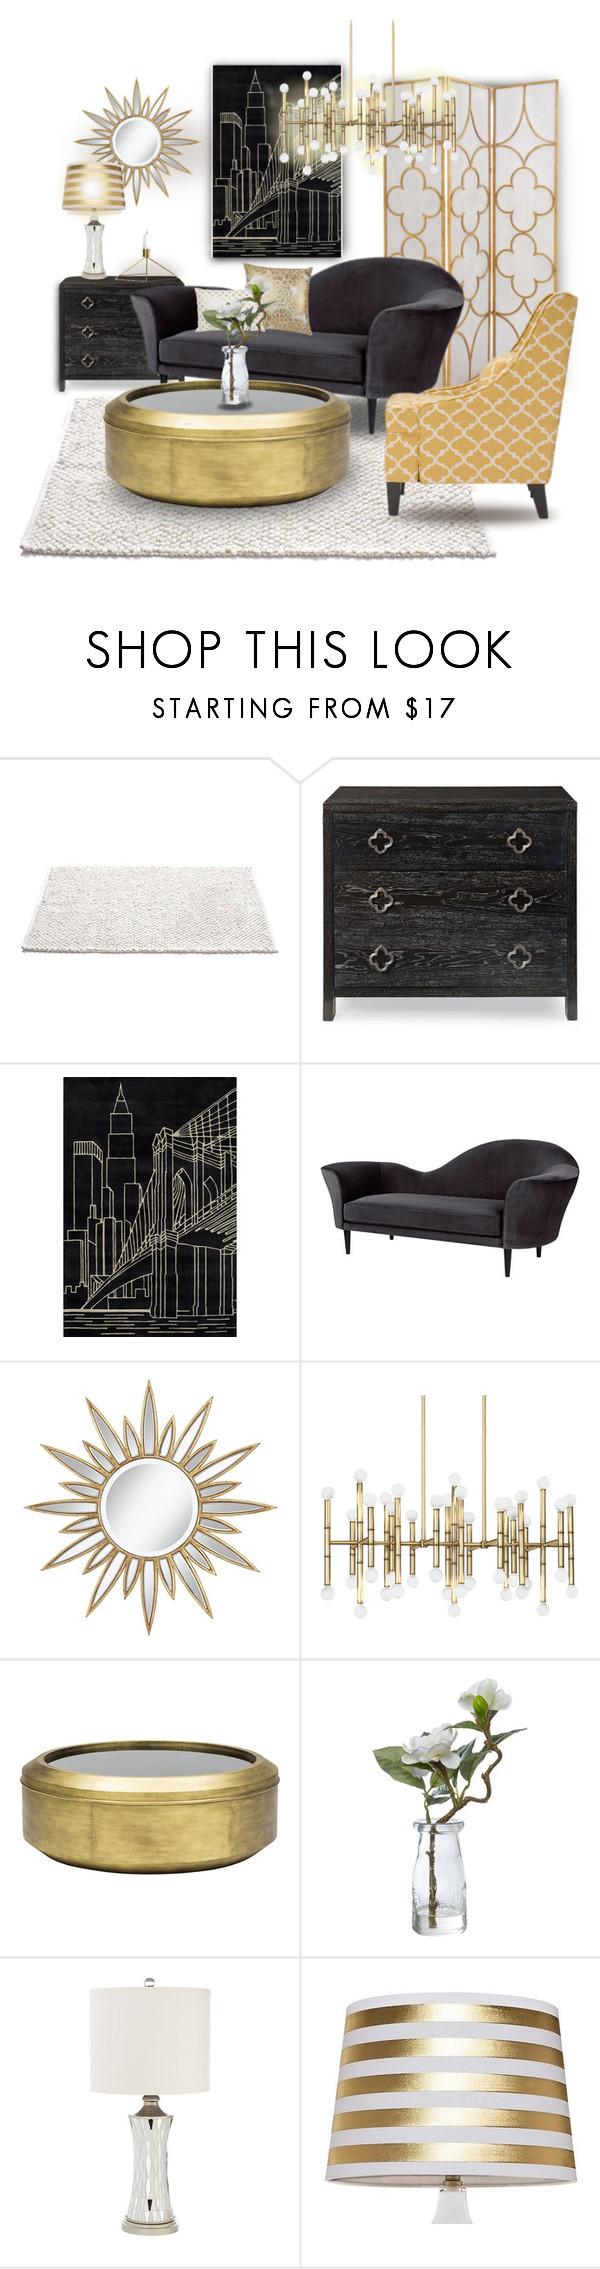 """Black & Gold"" by missblue1 on Polyvore featuring interior, interiors, interior design, дом, home decor, interior"